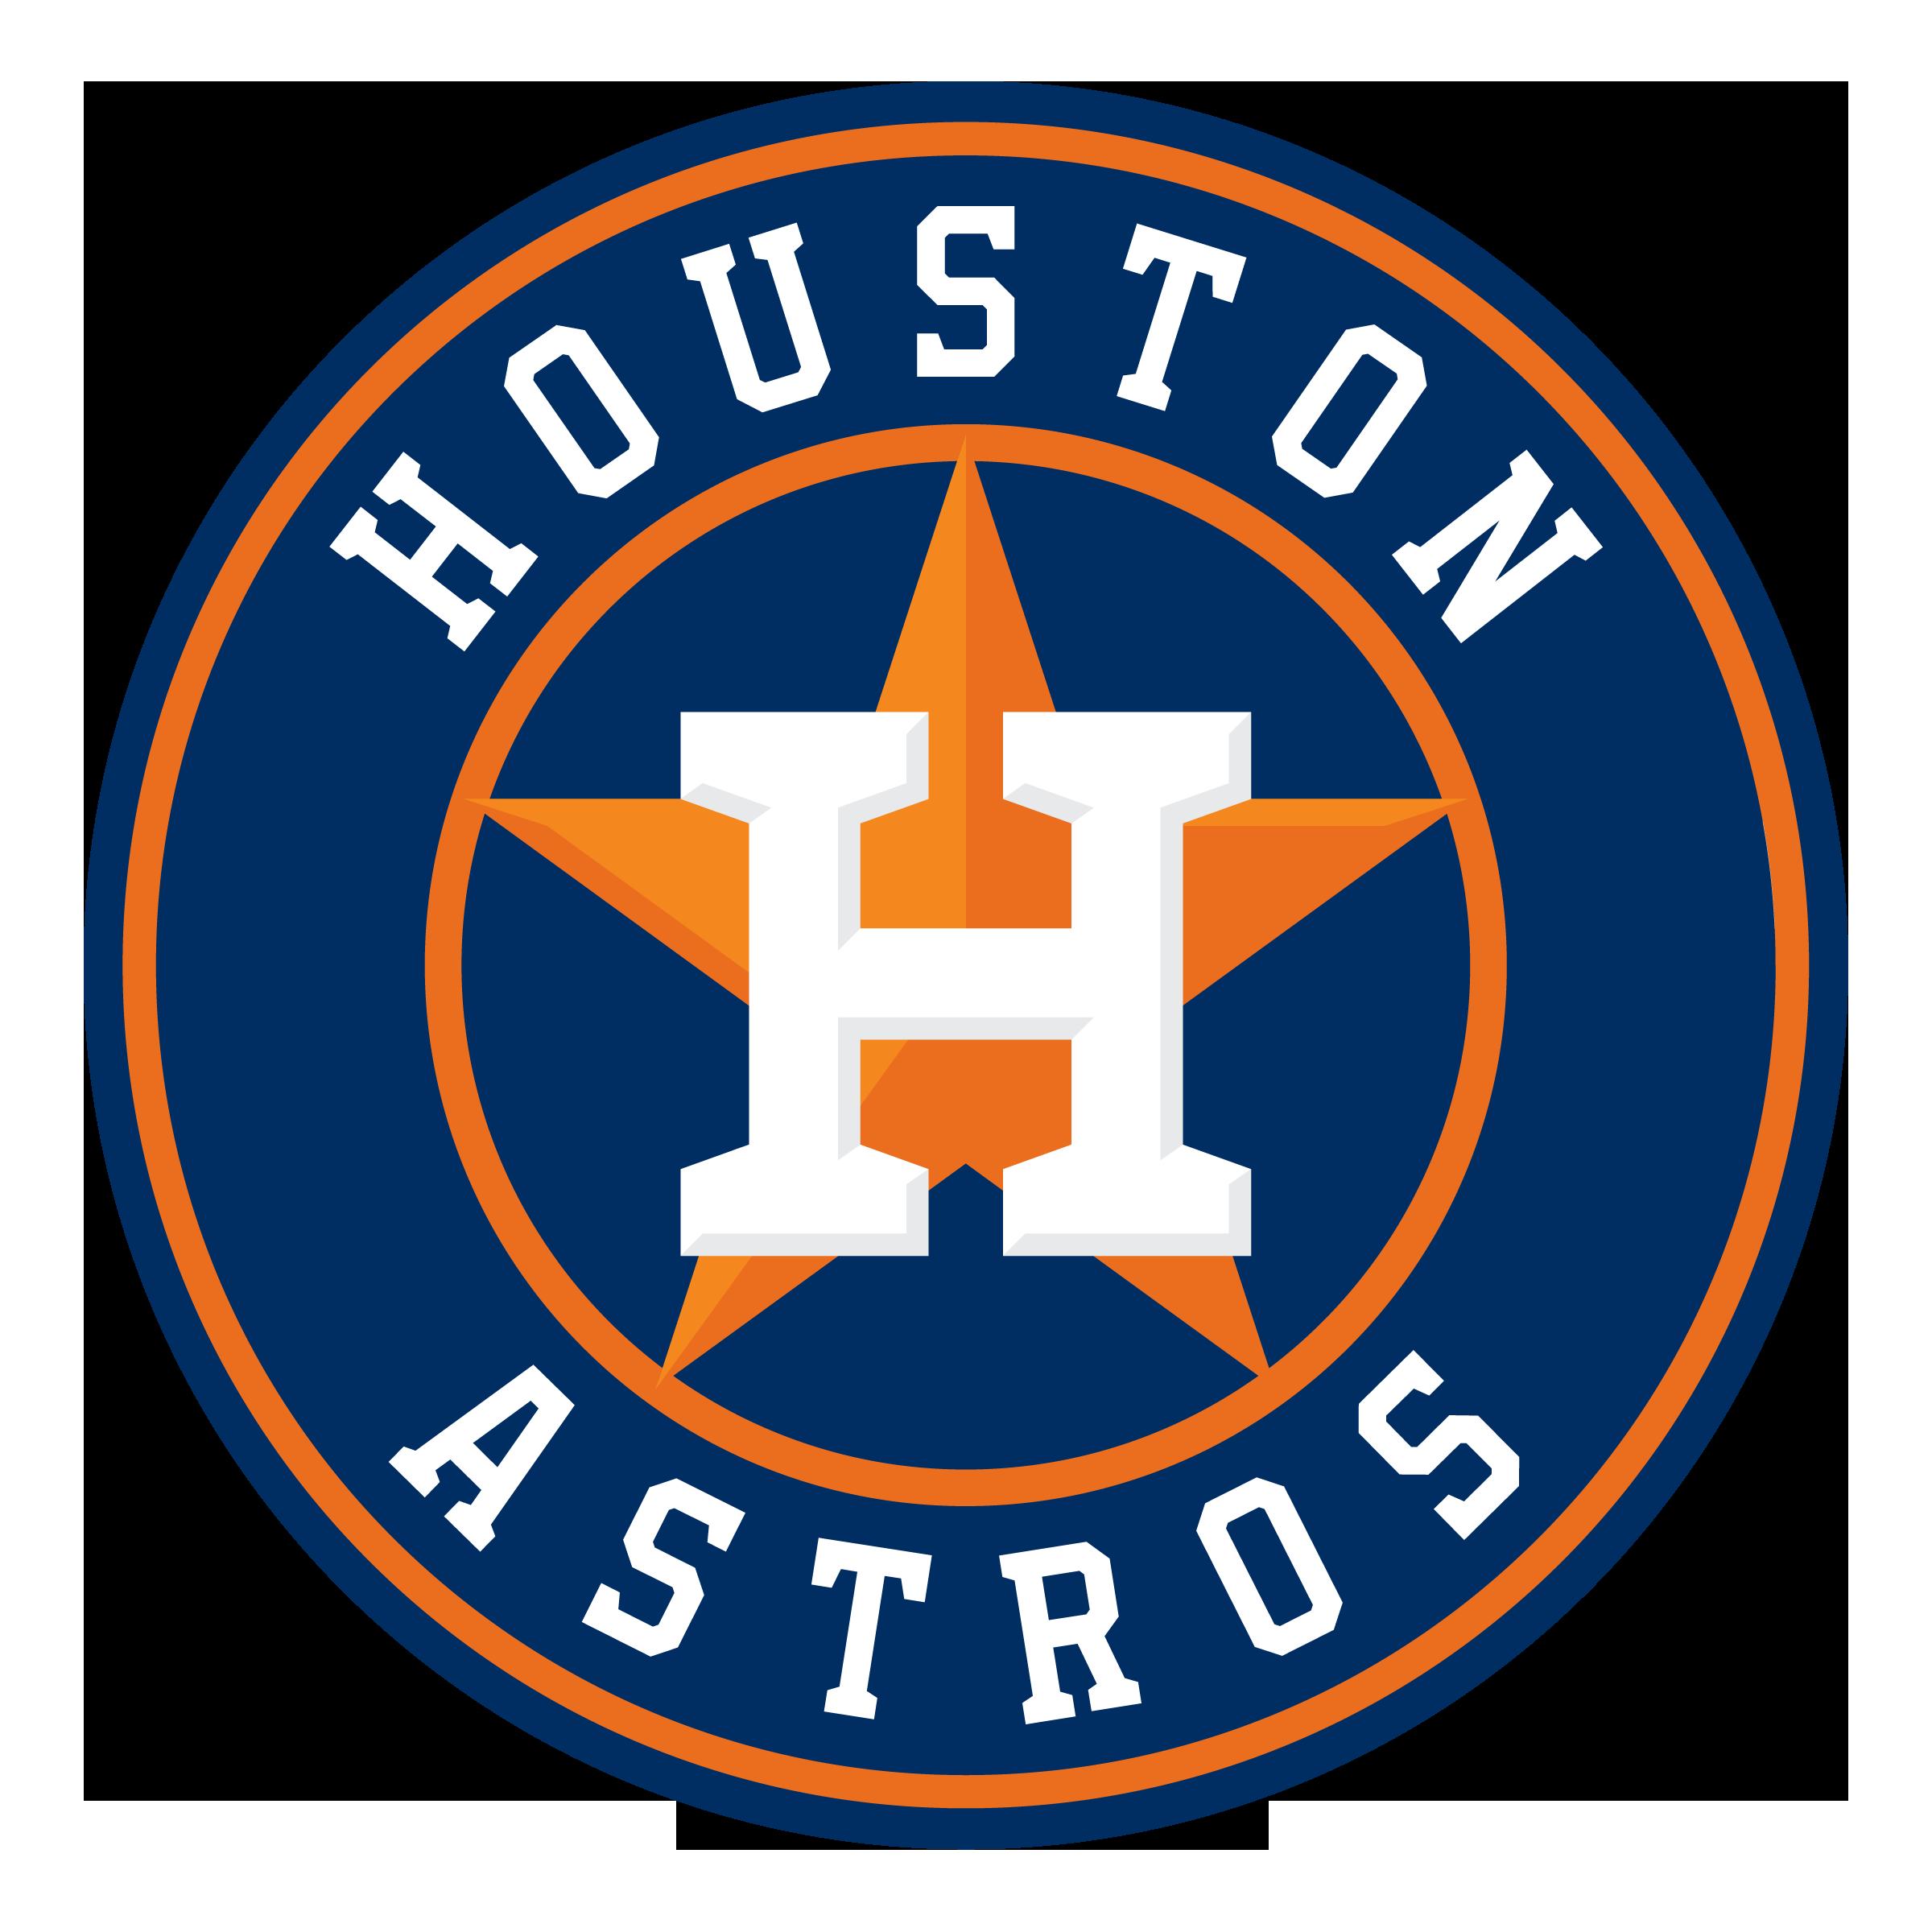 Houston Astros Logo PNG Image.